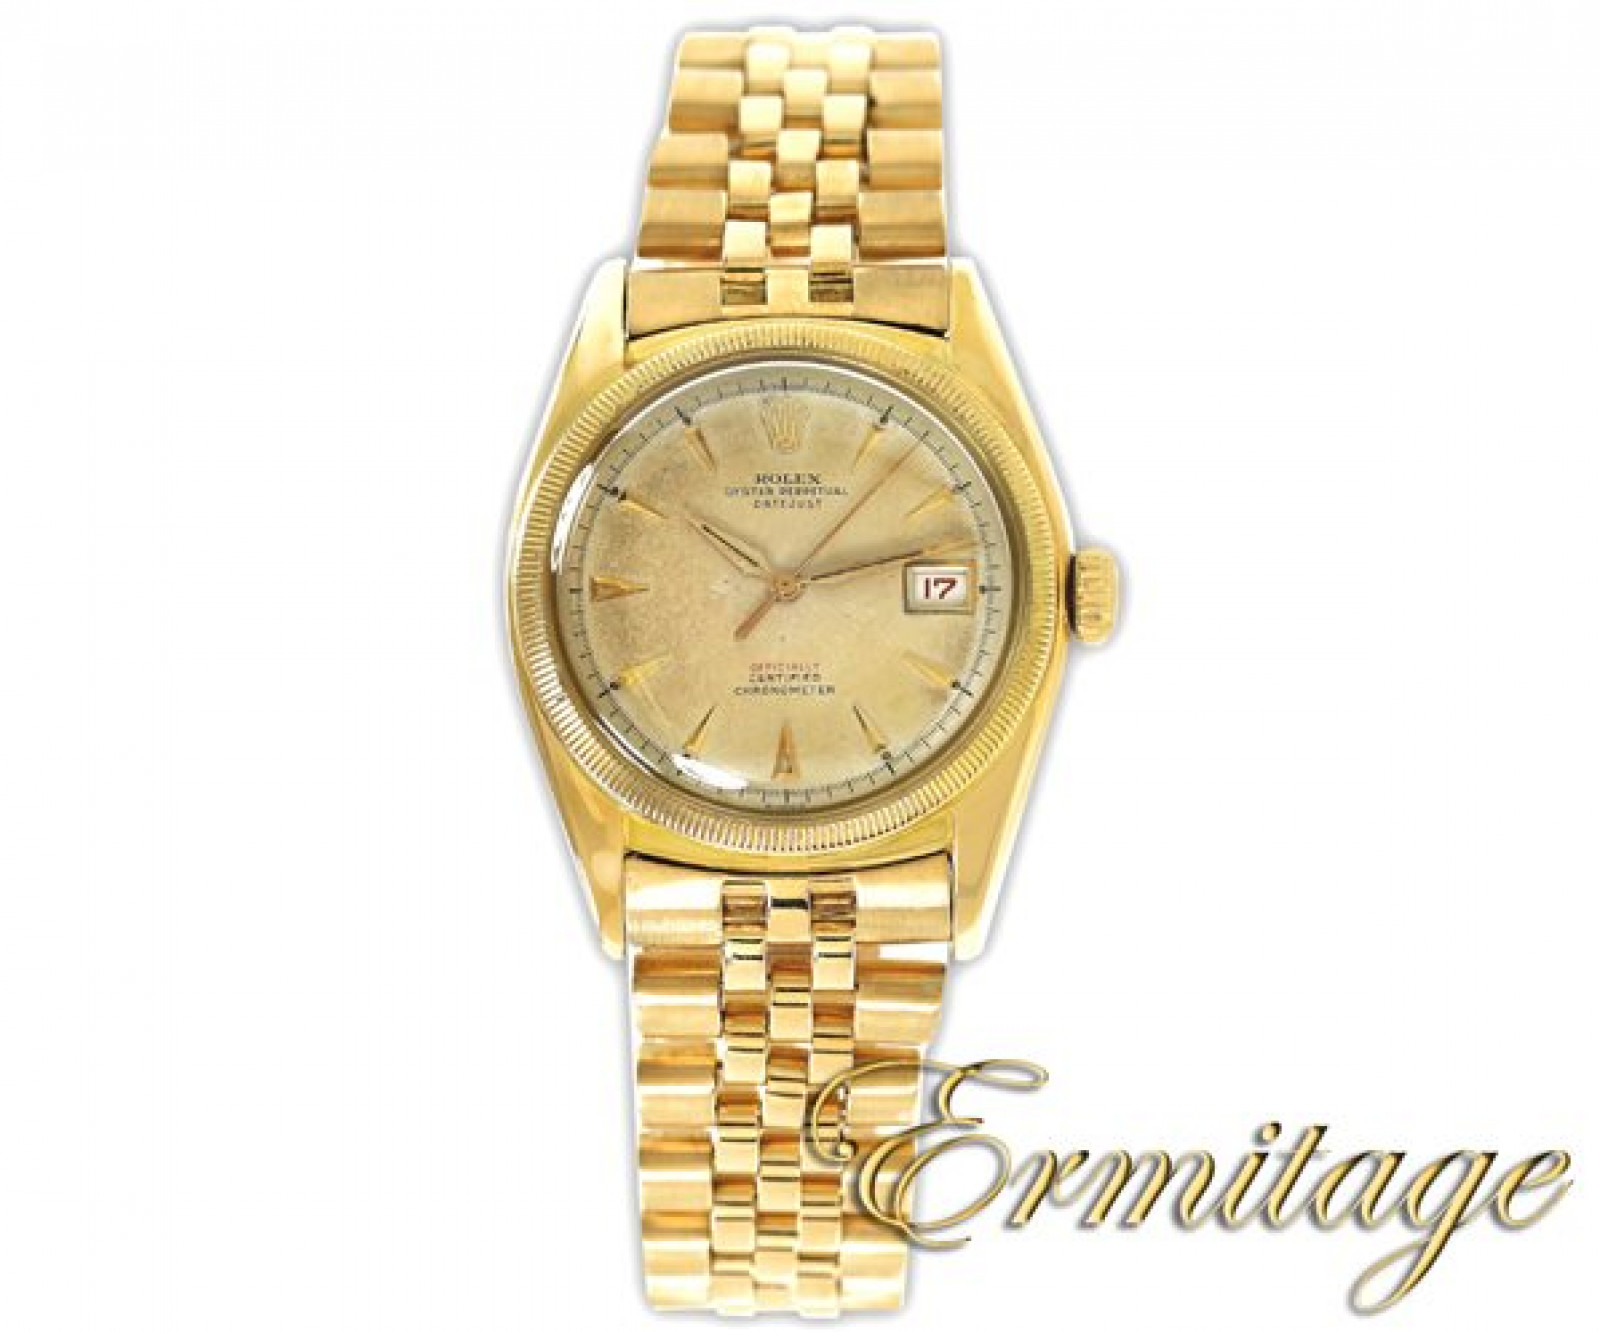 Vintage Rolex Datejust 6105 Gold